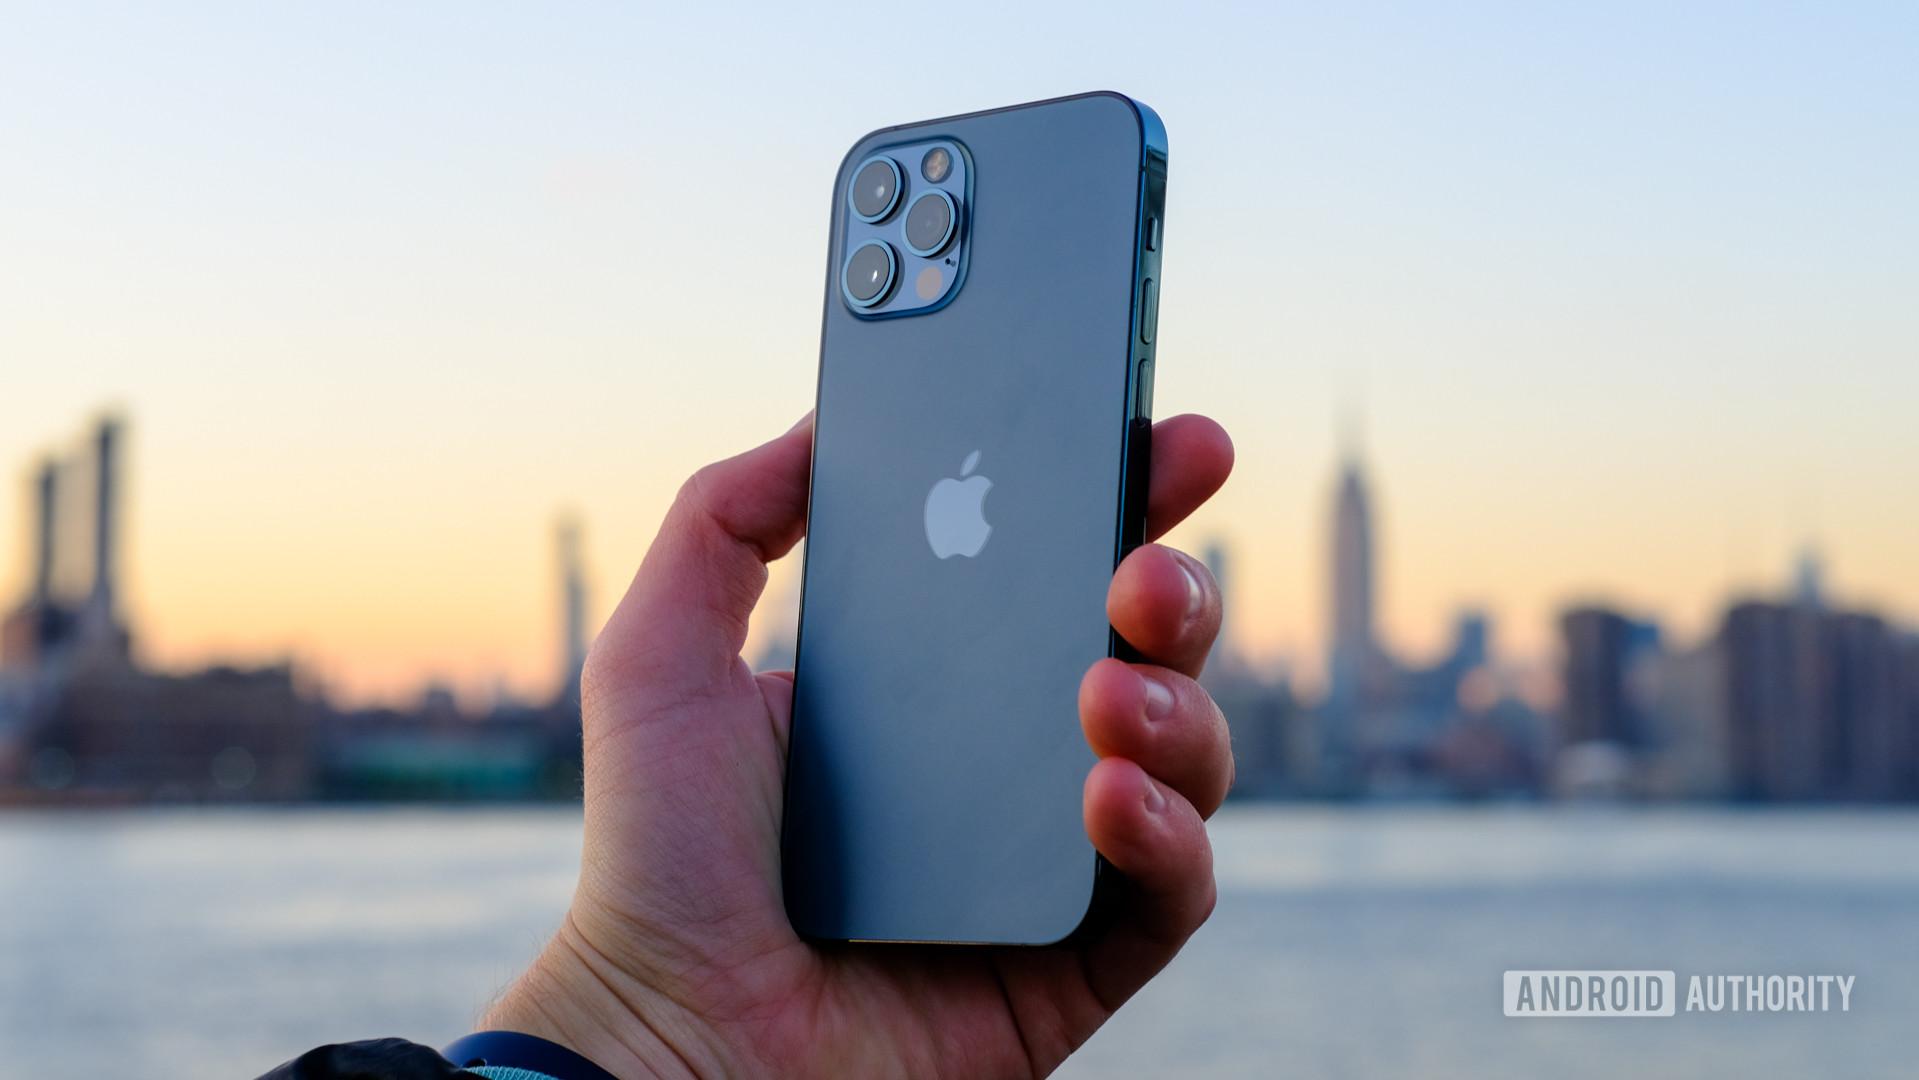 iPhone 12 Pro holding bakc of phone against sunset